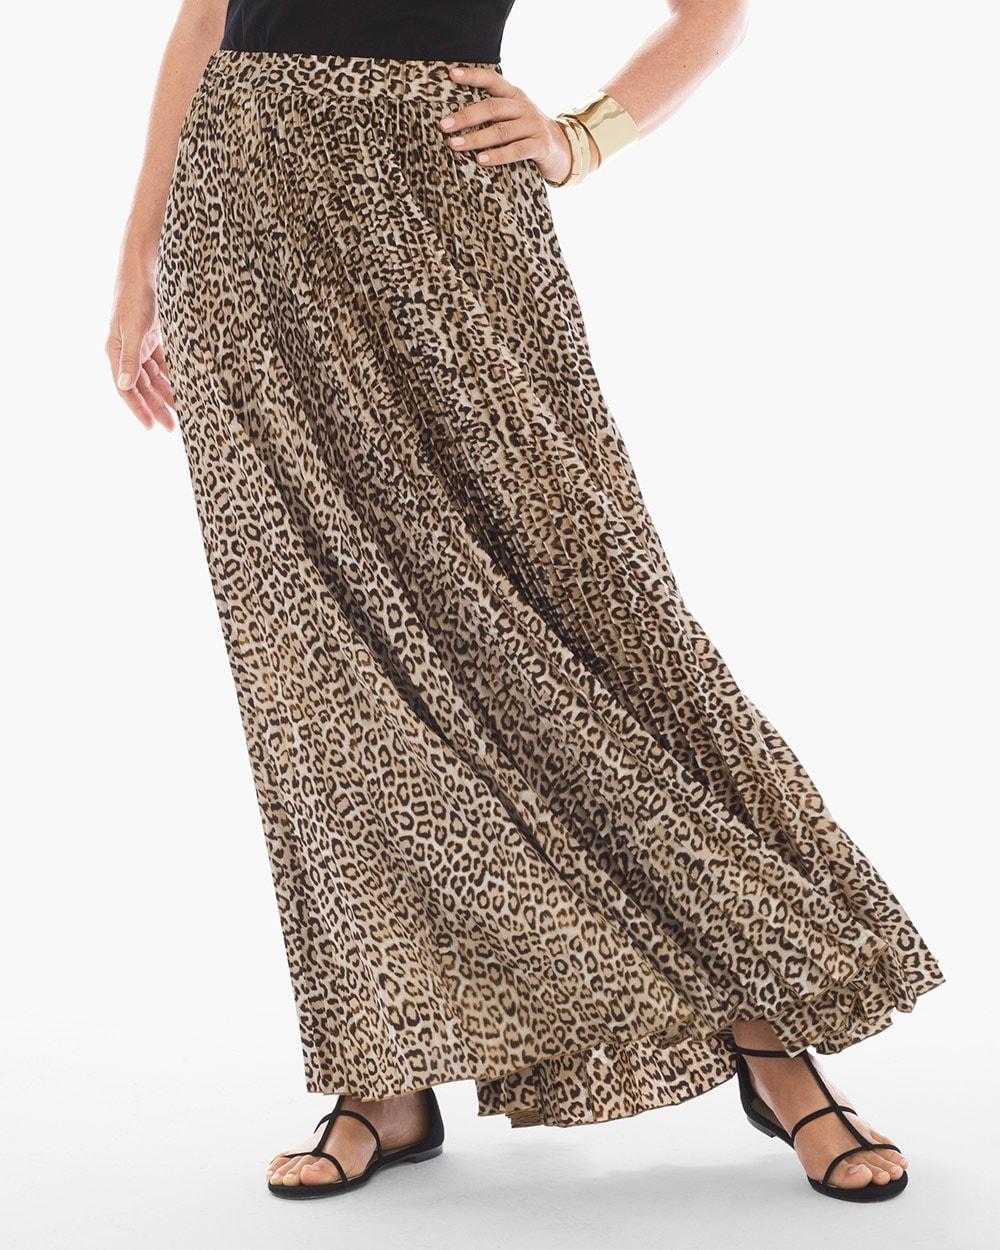 Leopard Maxi Skirt Chicos